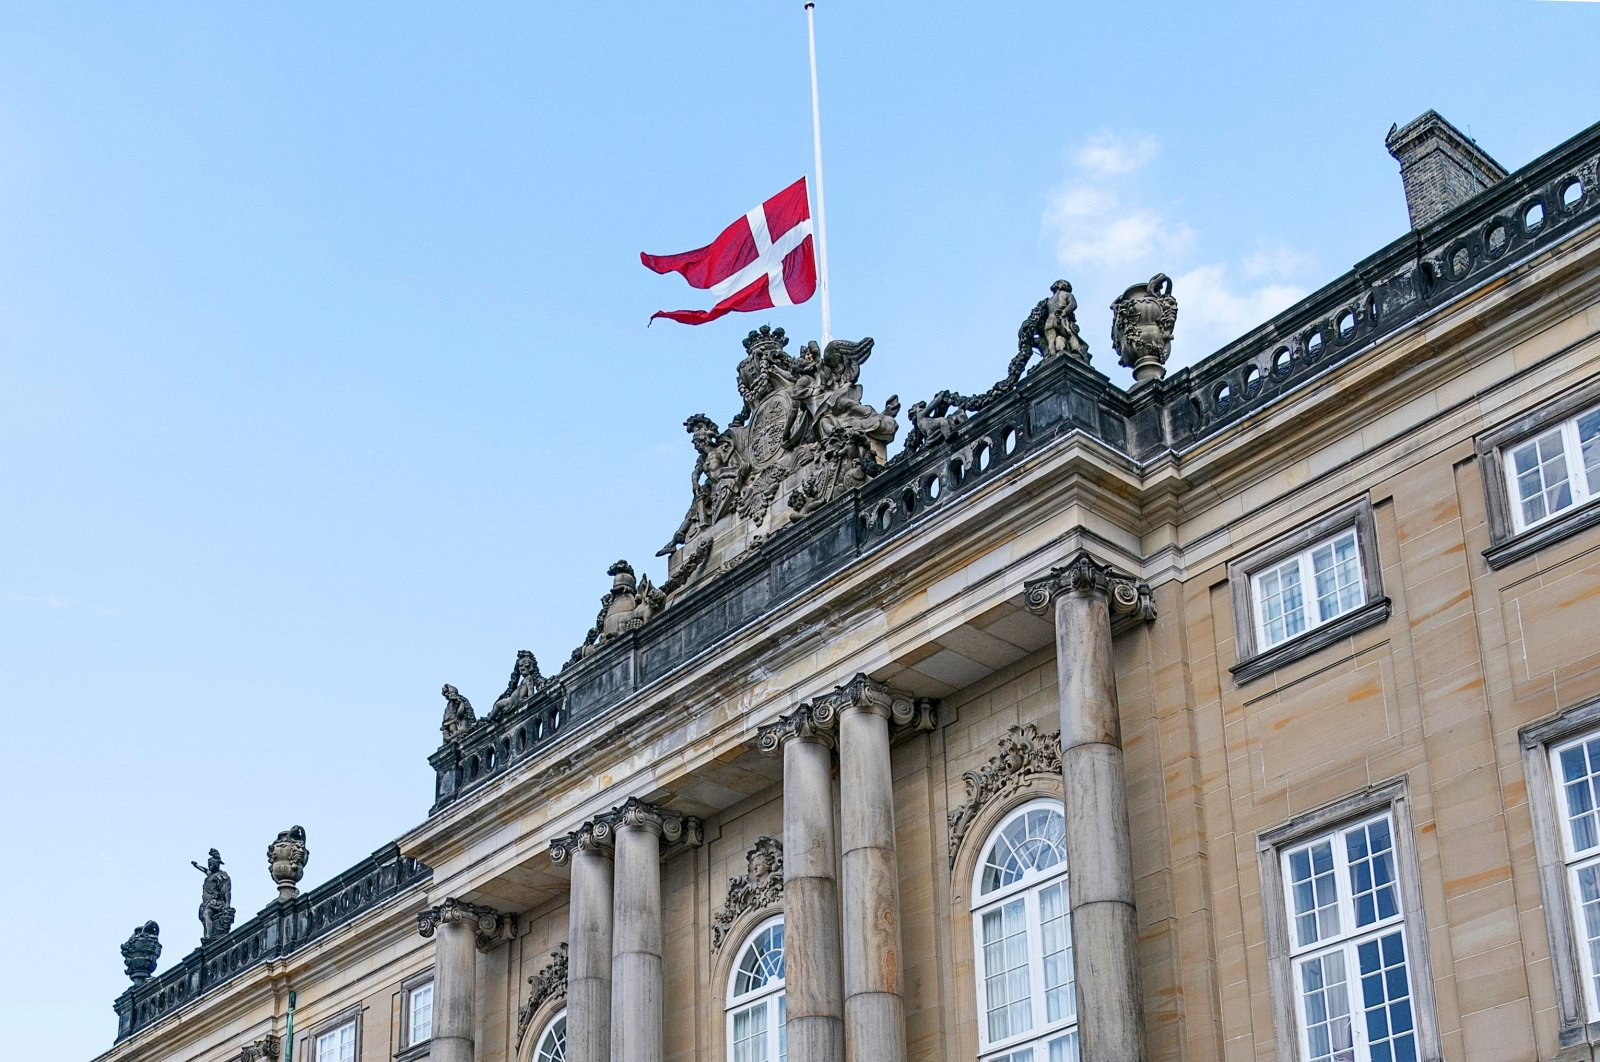 The Danish national flag flies at half-mast at Amalienborg Palace in Copenhagen, Denmark, April 17, 2021 (AFP Photo)